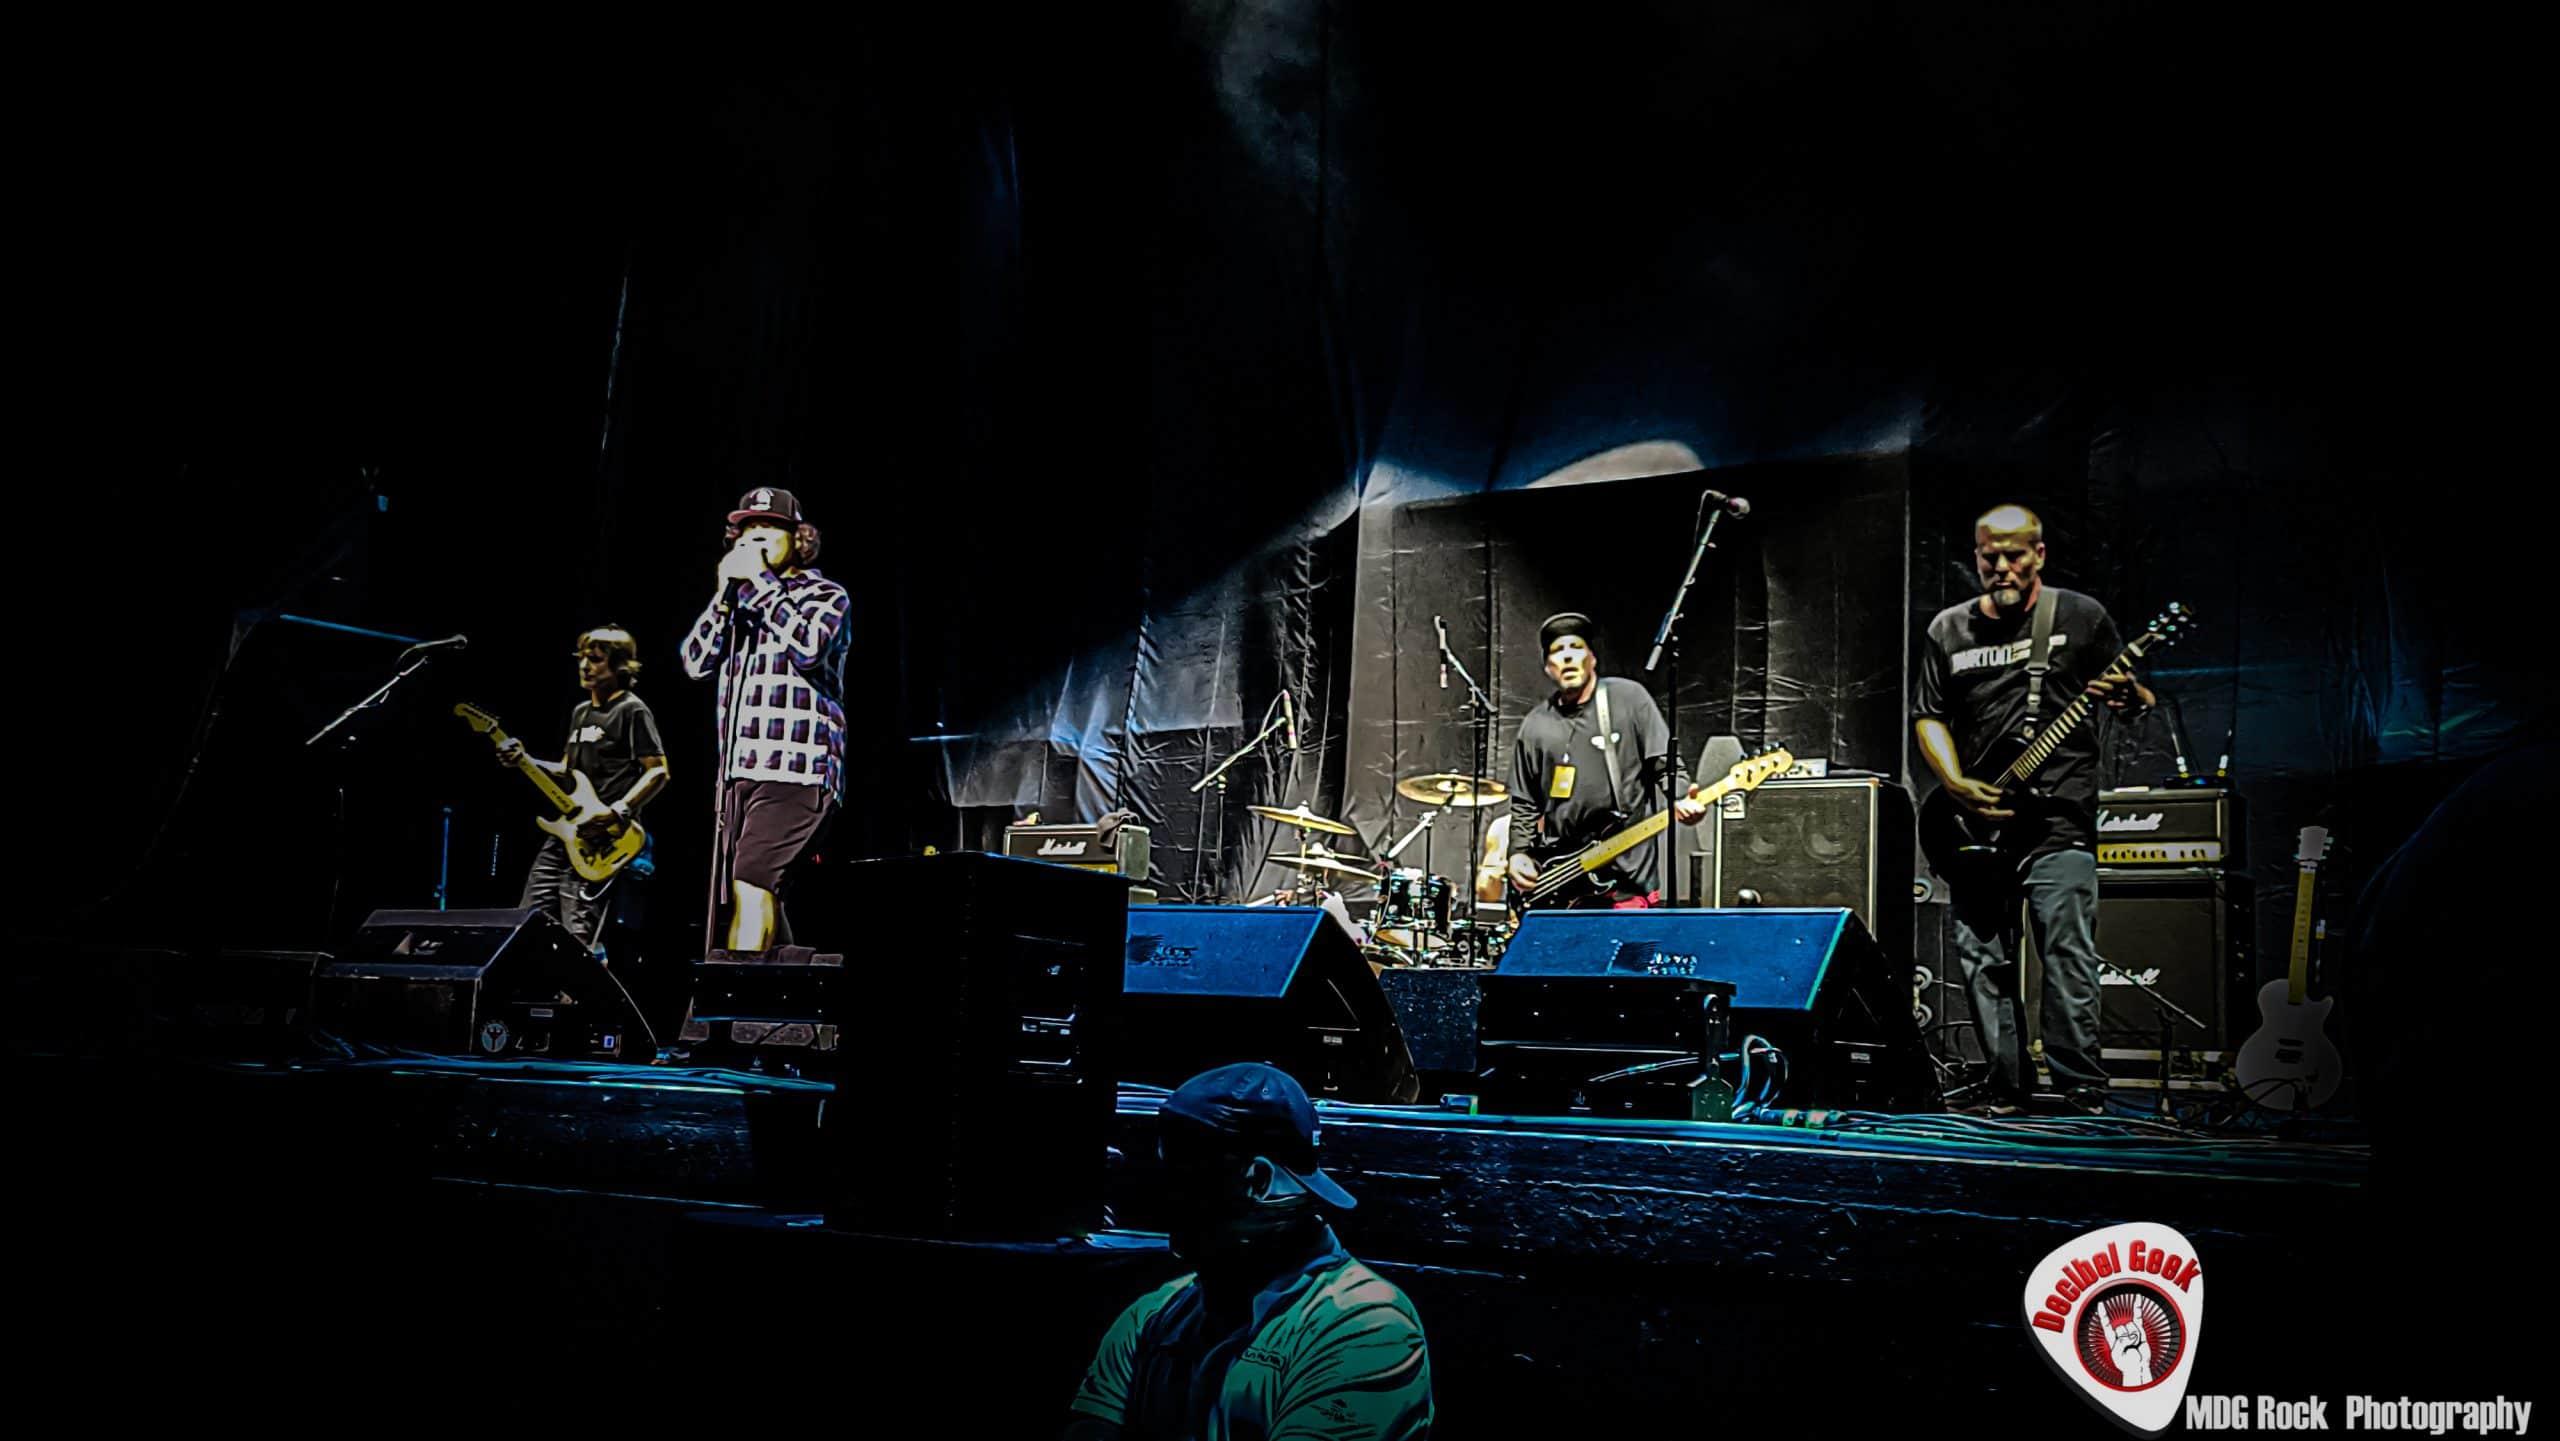 Ugly Kid Joe, Virginia Beach, UKJ, Whitfield Crane, Klaus Eichstadt, Dave Fortman, Cordell Crockett, Zac Morris, Heavy Metal, Band, Metal, Music